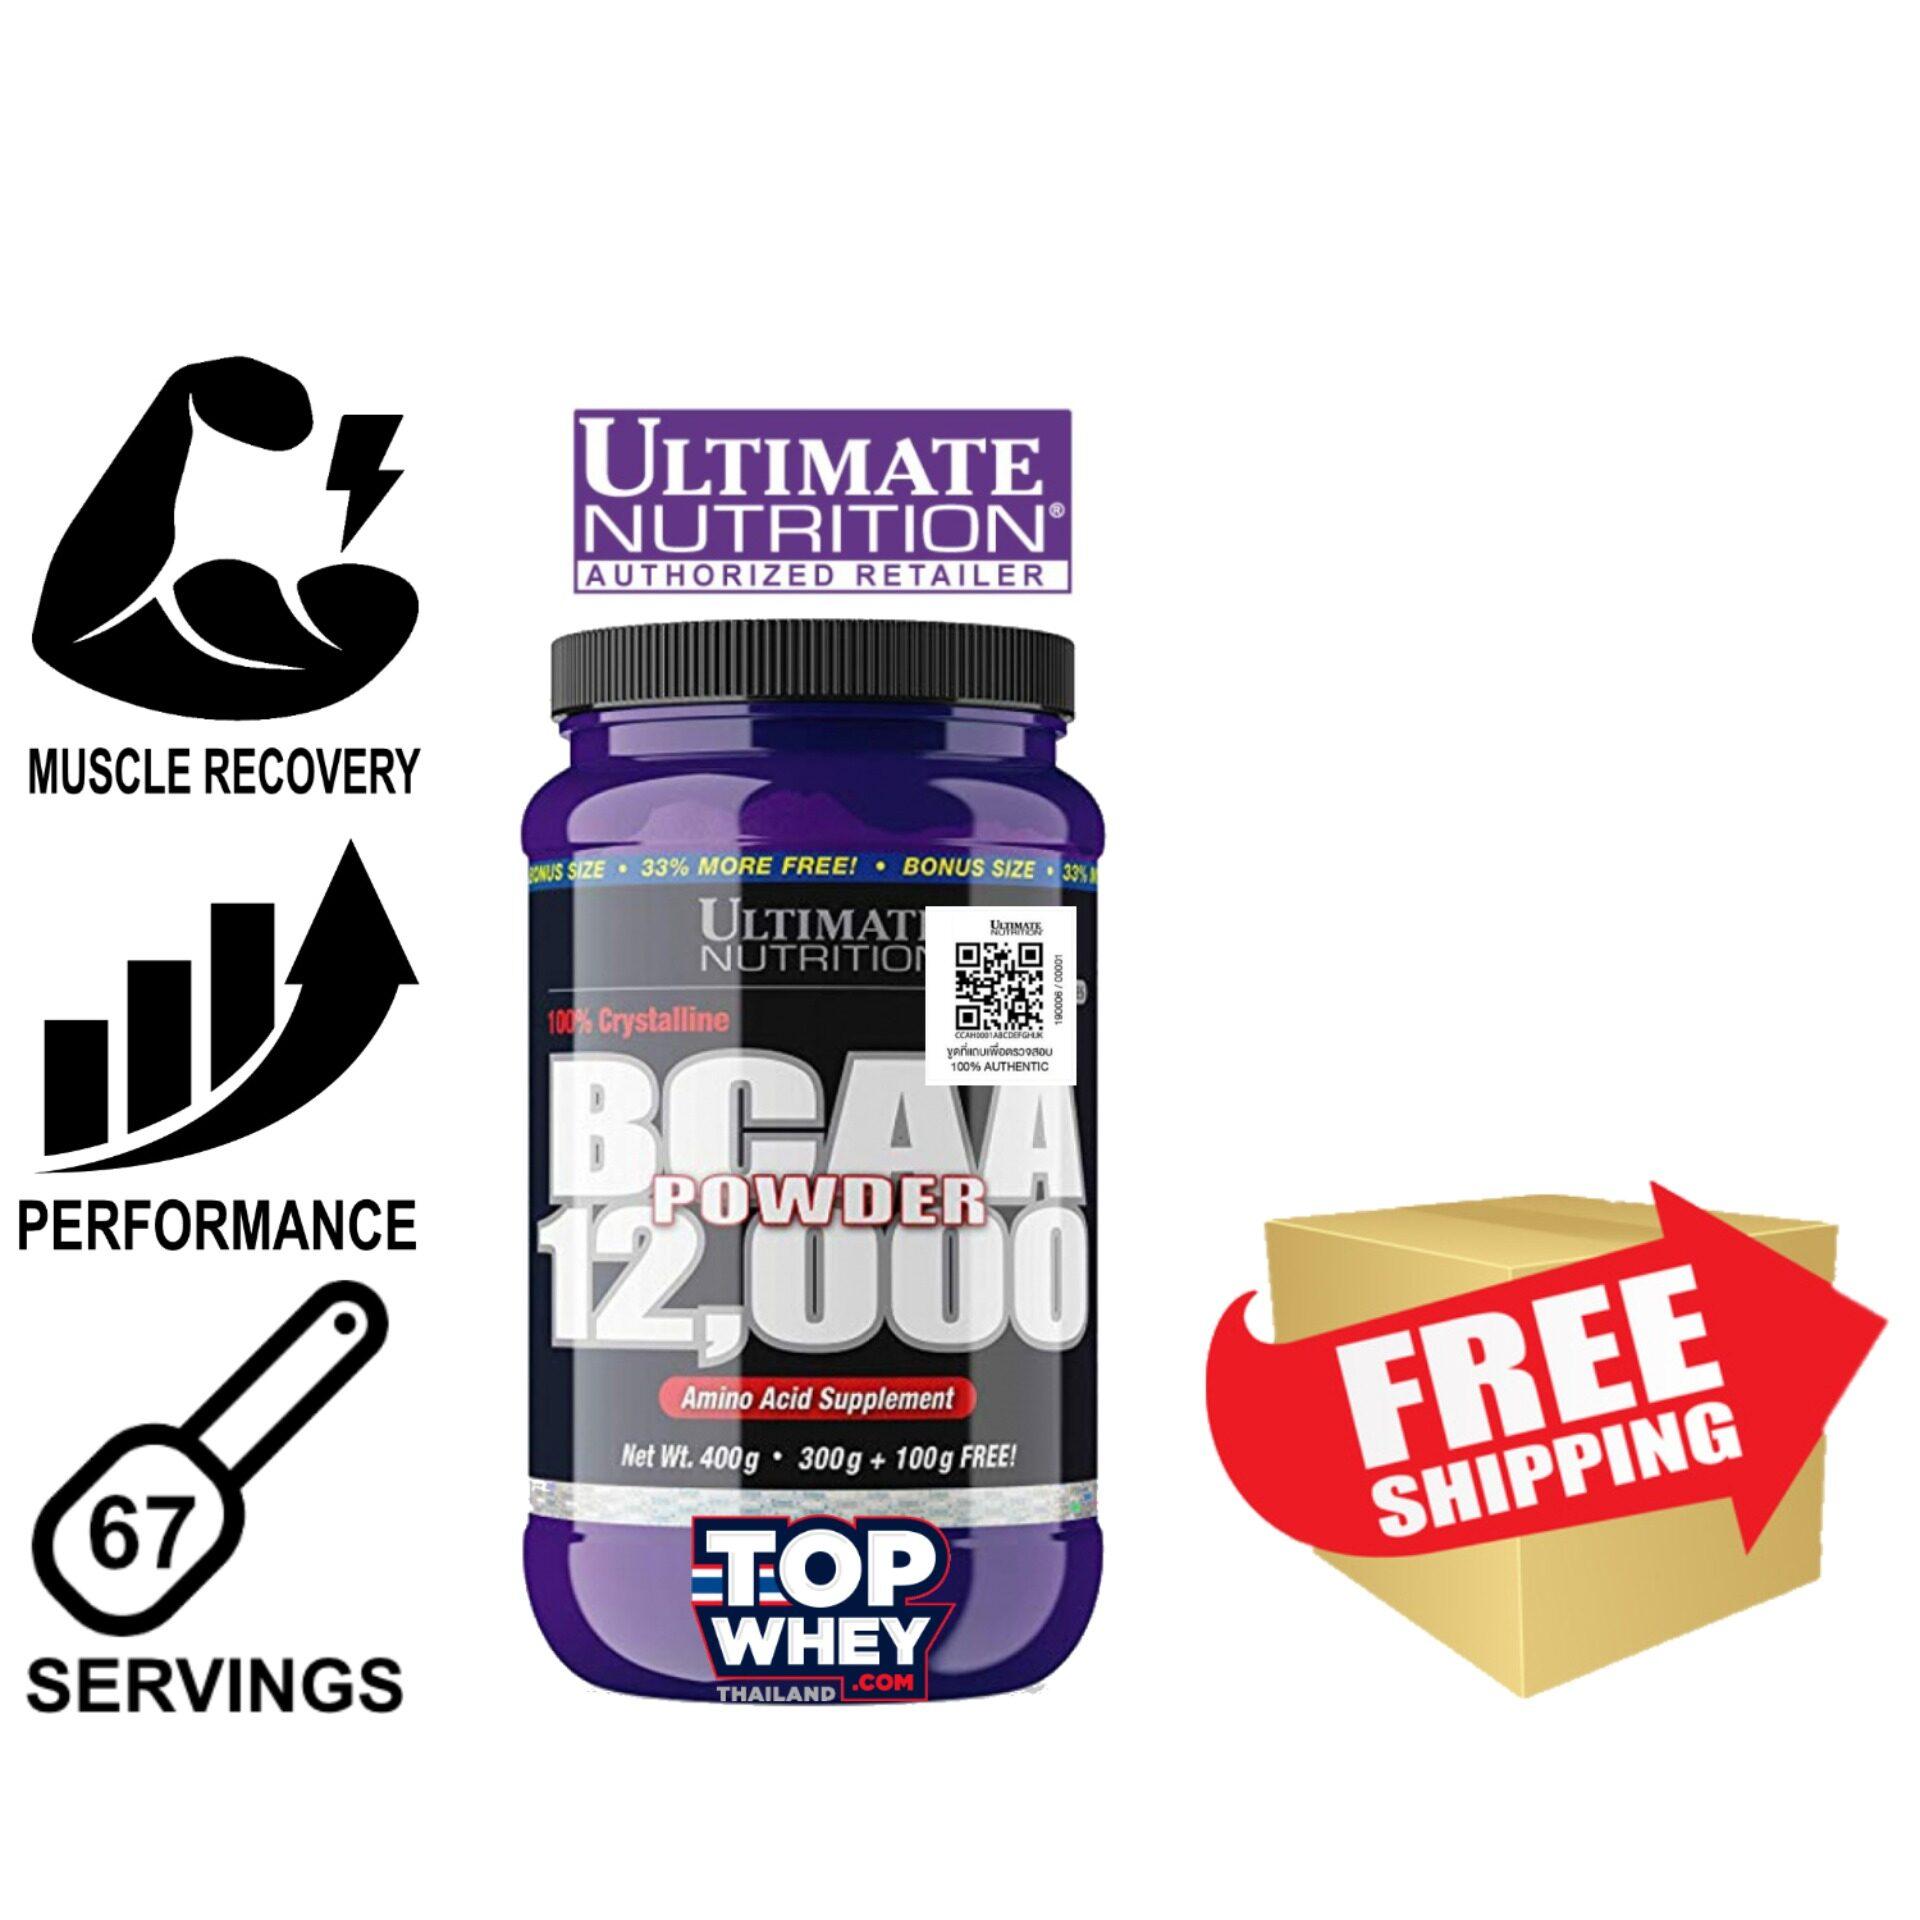 Ultimate Nutrition BCAA 12000 Powder 67 Servings 400g – Unflavored – บีซีเอเอ ซ่อมแซมกล้ามเนื้อ ยับยั้งการสลายกล้ามเนื้อ มีส่วนสำคัญในการสร้างกล้ามเนื้อ เพิ่มประสิทธิภาพในการออกกำลังกาย